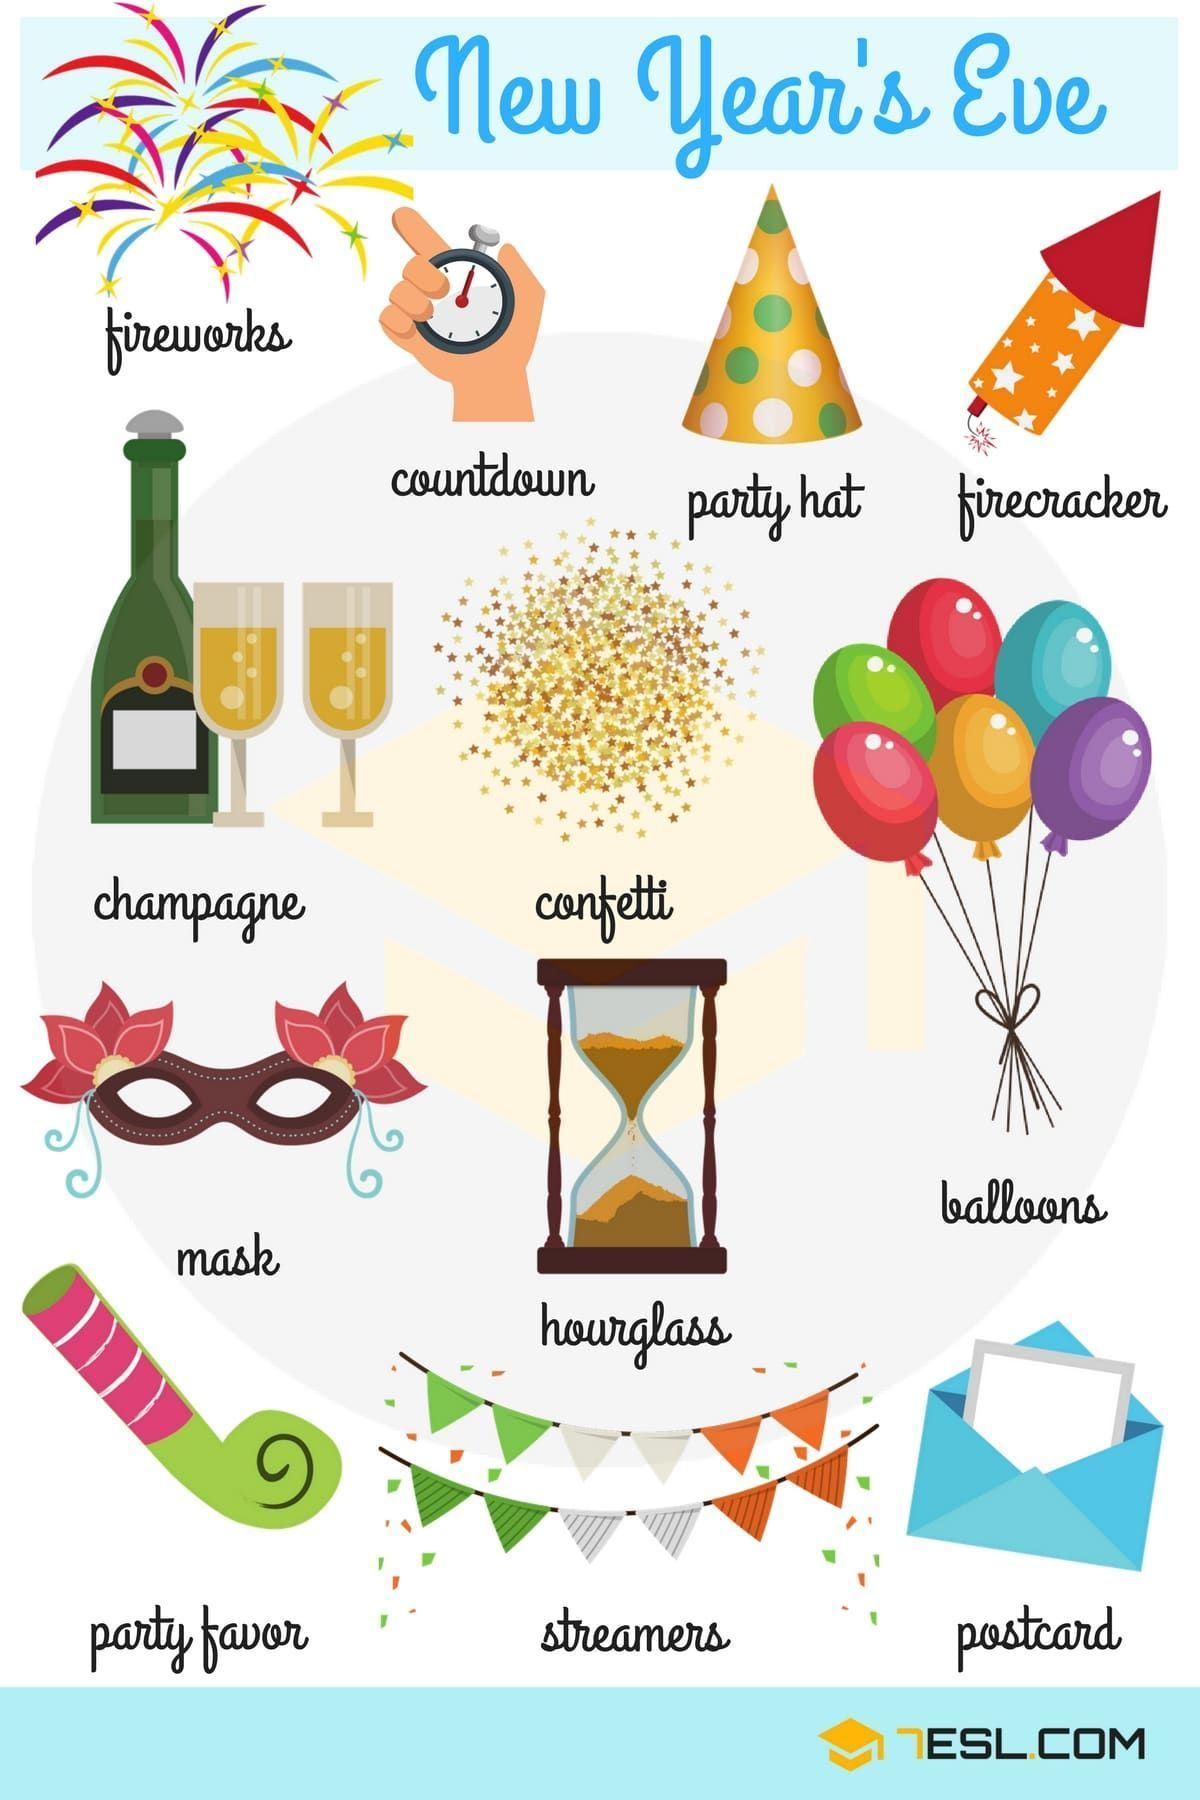 New Year's Eve Vocabulary Verbos para niños, Vocabulario